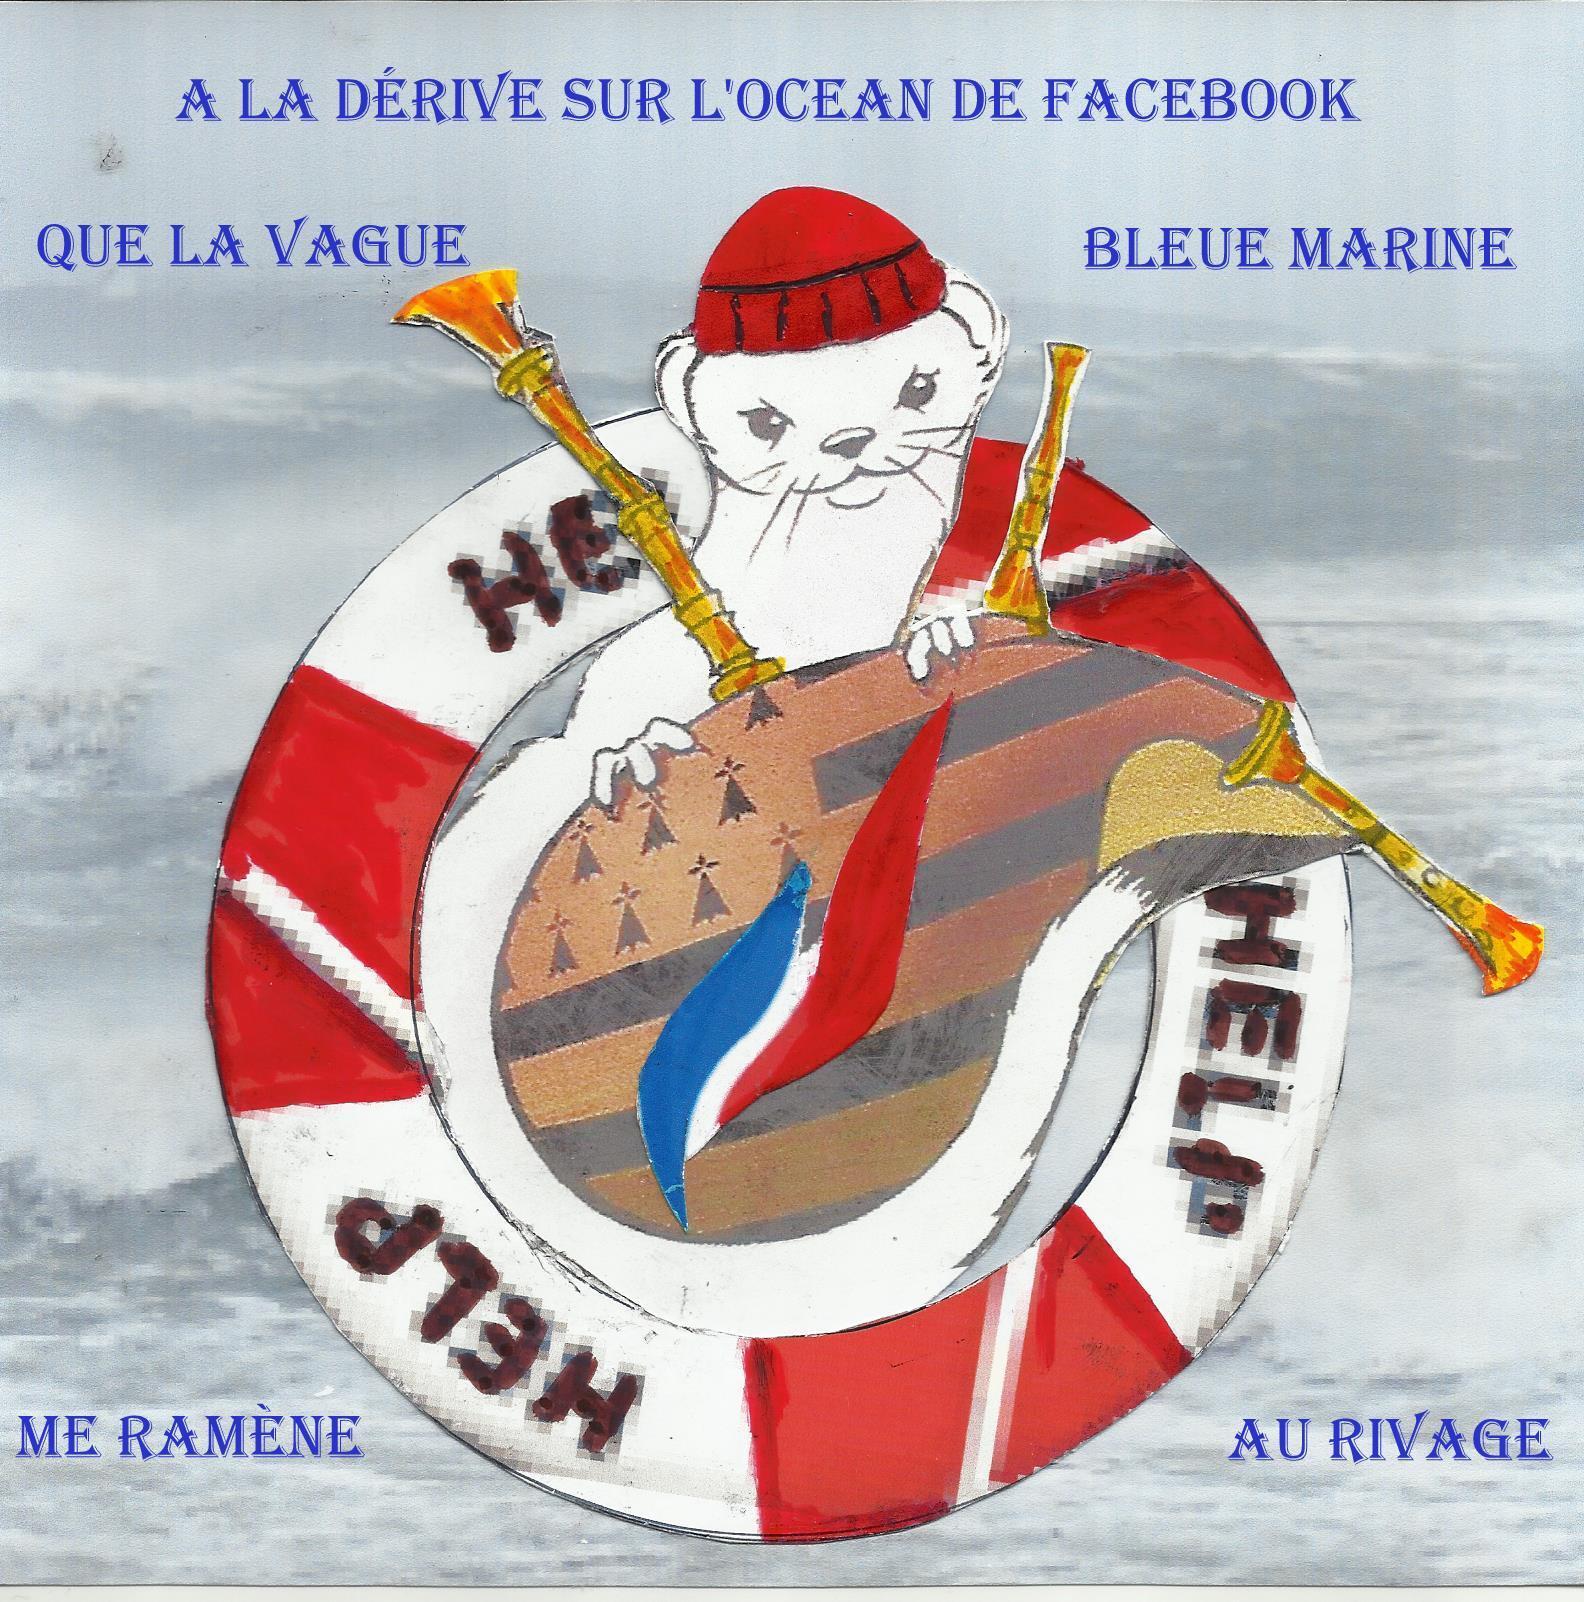 profil facebook: christian henri leparoux